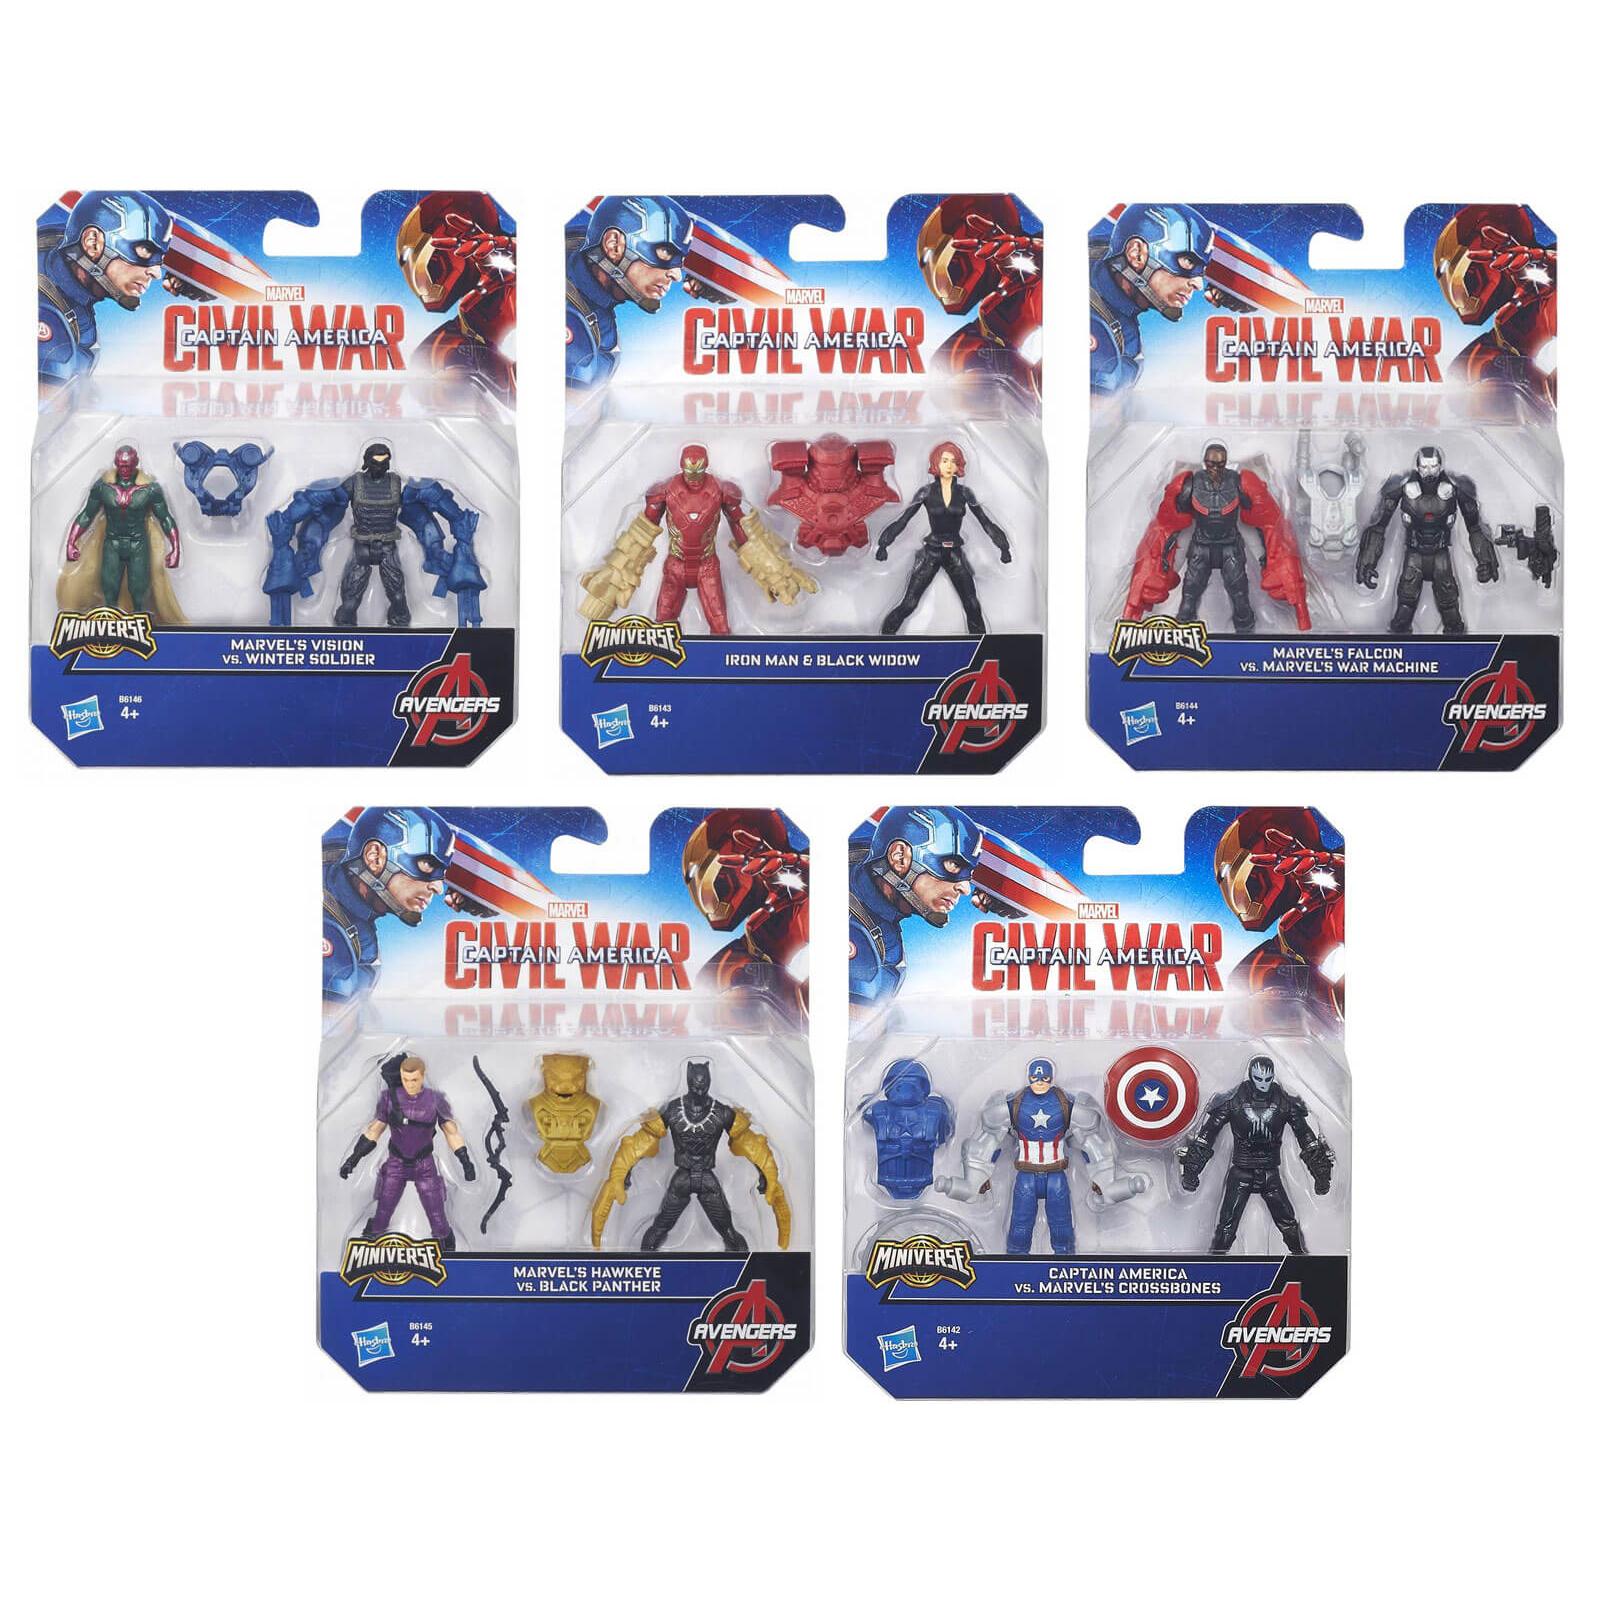 Набор из 2 фигурок Мстителей из серии AvengersAvengers (Мстители)<br>Набор из 2 фигурок Мстителей из серии Avengers<br>